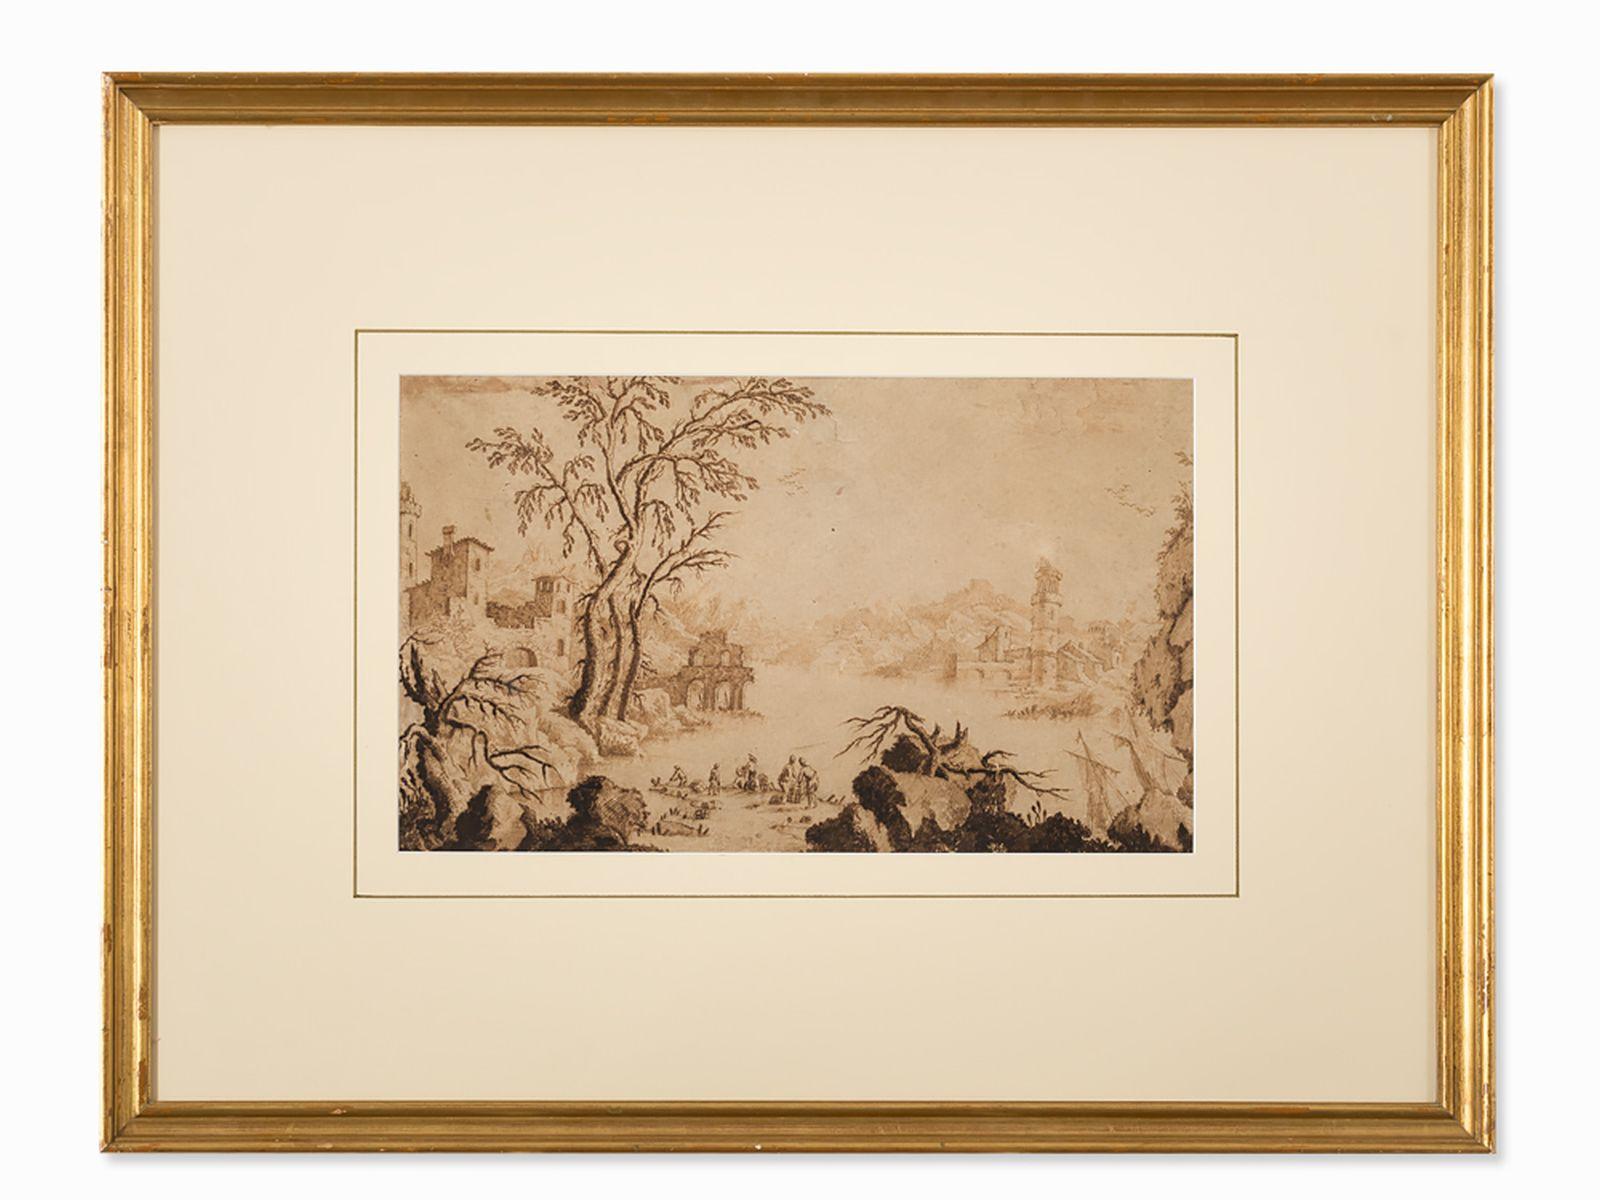 #64 Francesco Bosio (active 1725-1756), river landscape, 18th century | Francesco Bosio (tätig 1725-1756), Flusslandschaft, 18.Jh. Image